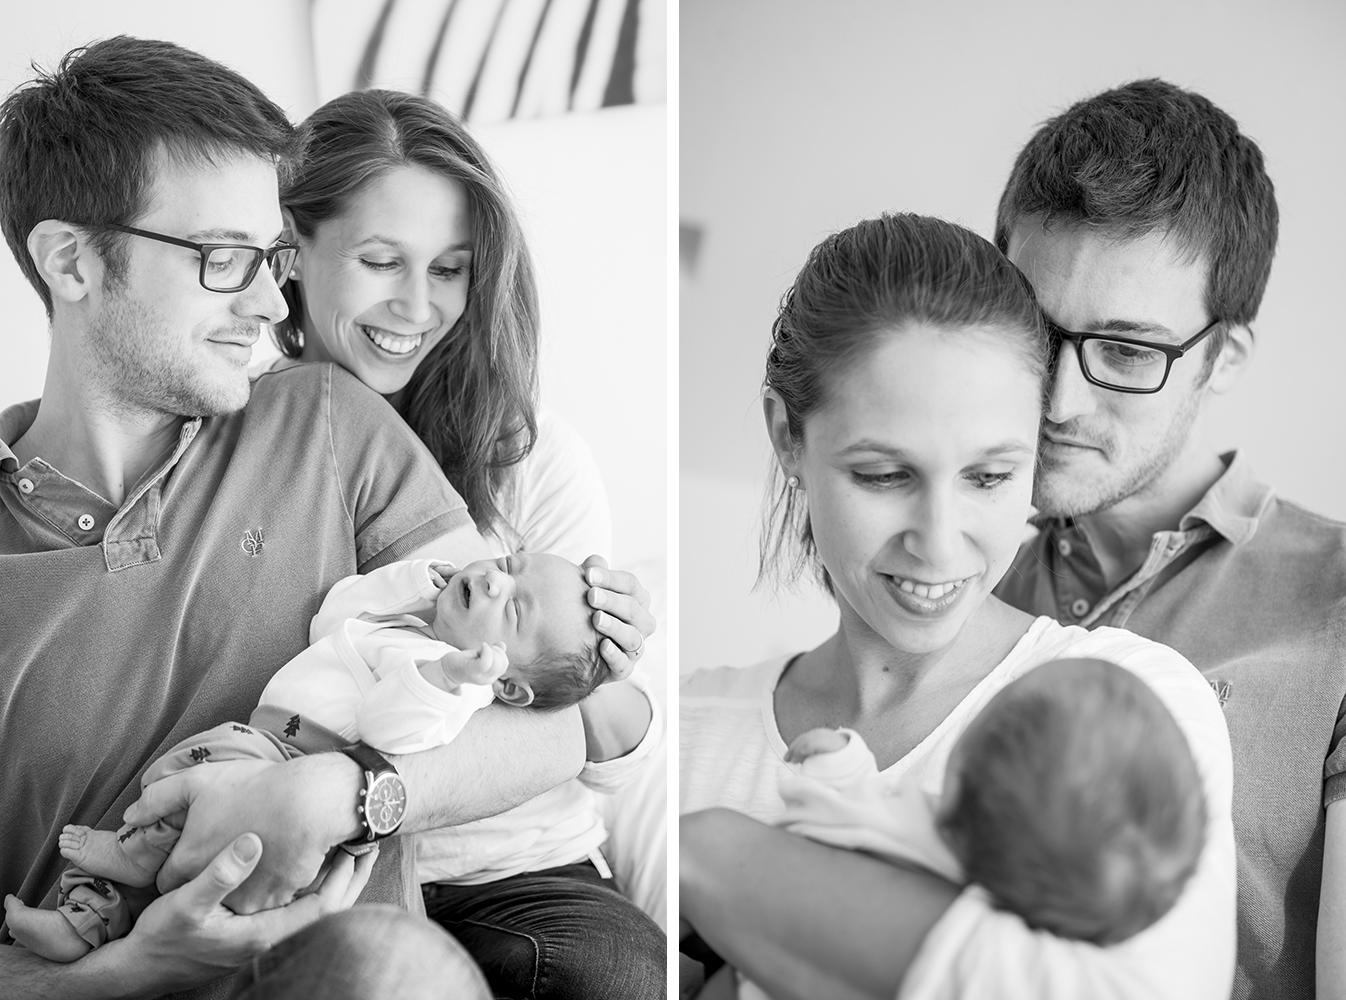 Familienreportage, Familie, Newborn, Welcome Baby, Hallo Baby, Glückseelig, Kinder, Eltern